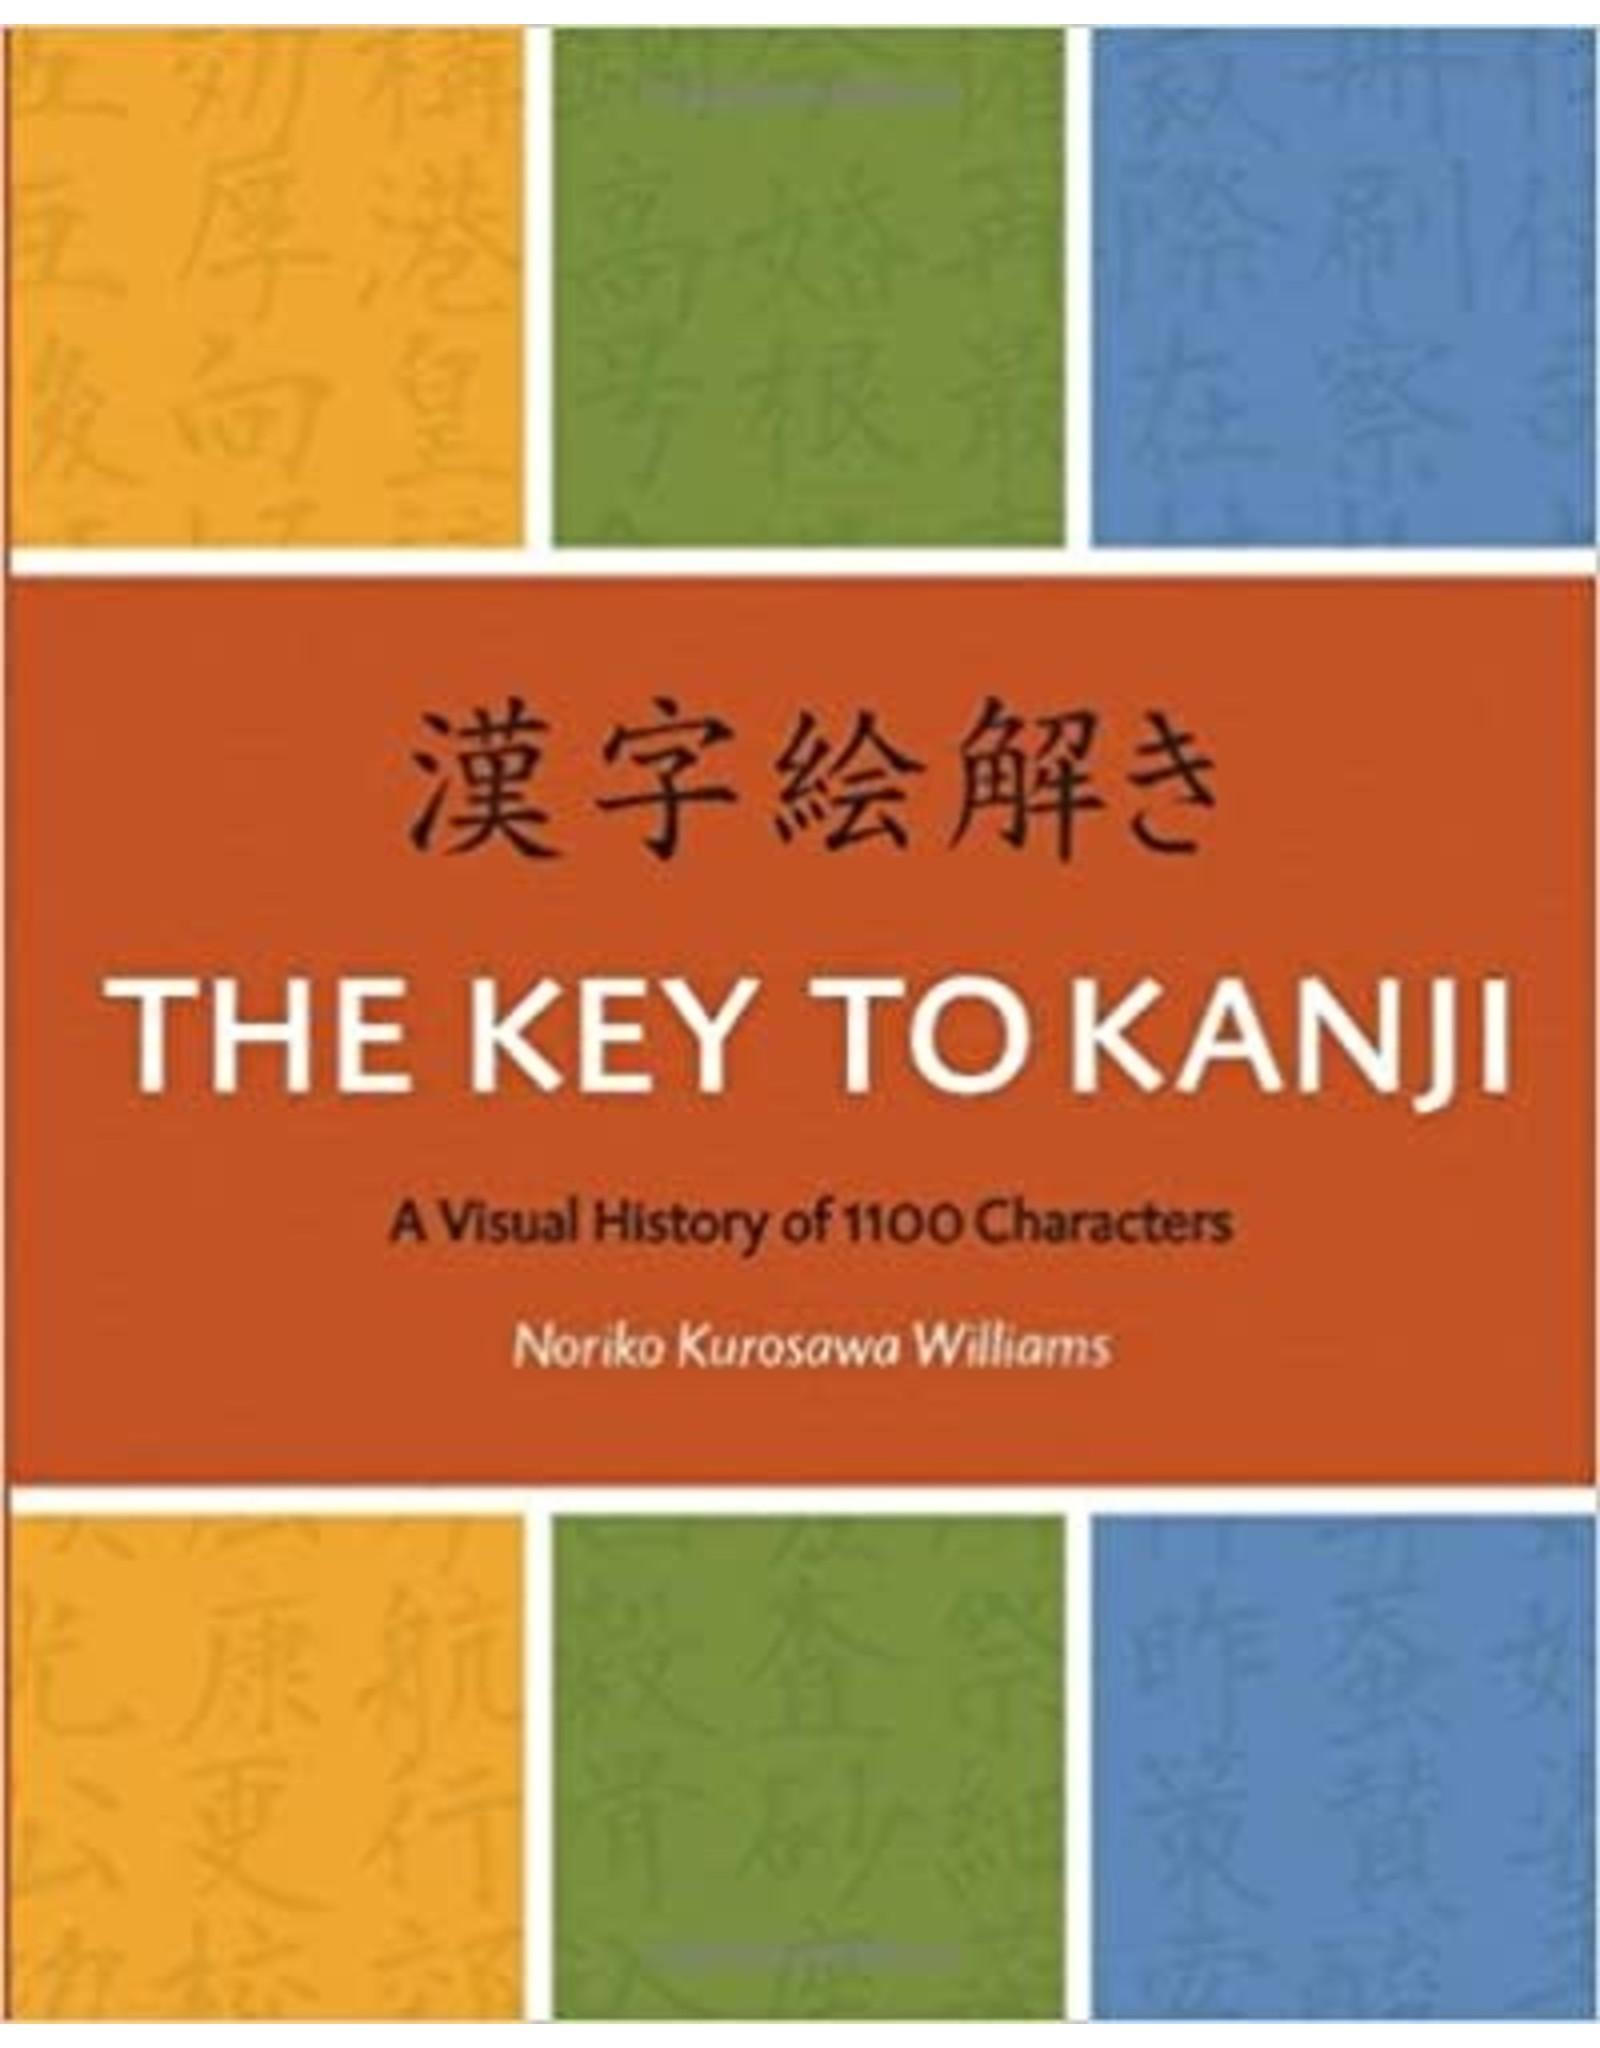 CHENG & TSUI KEY TO KANJI (2015)